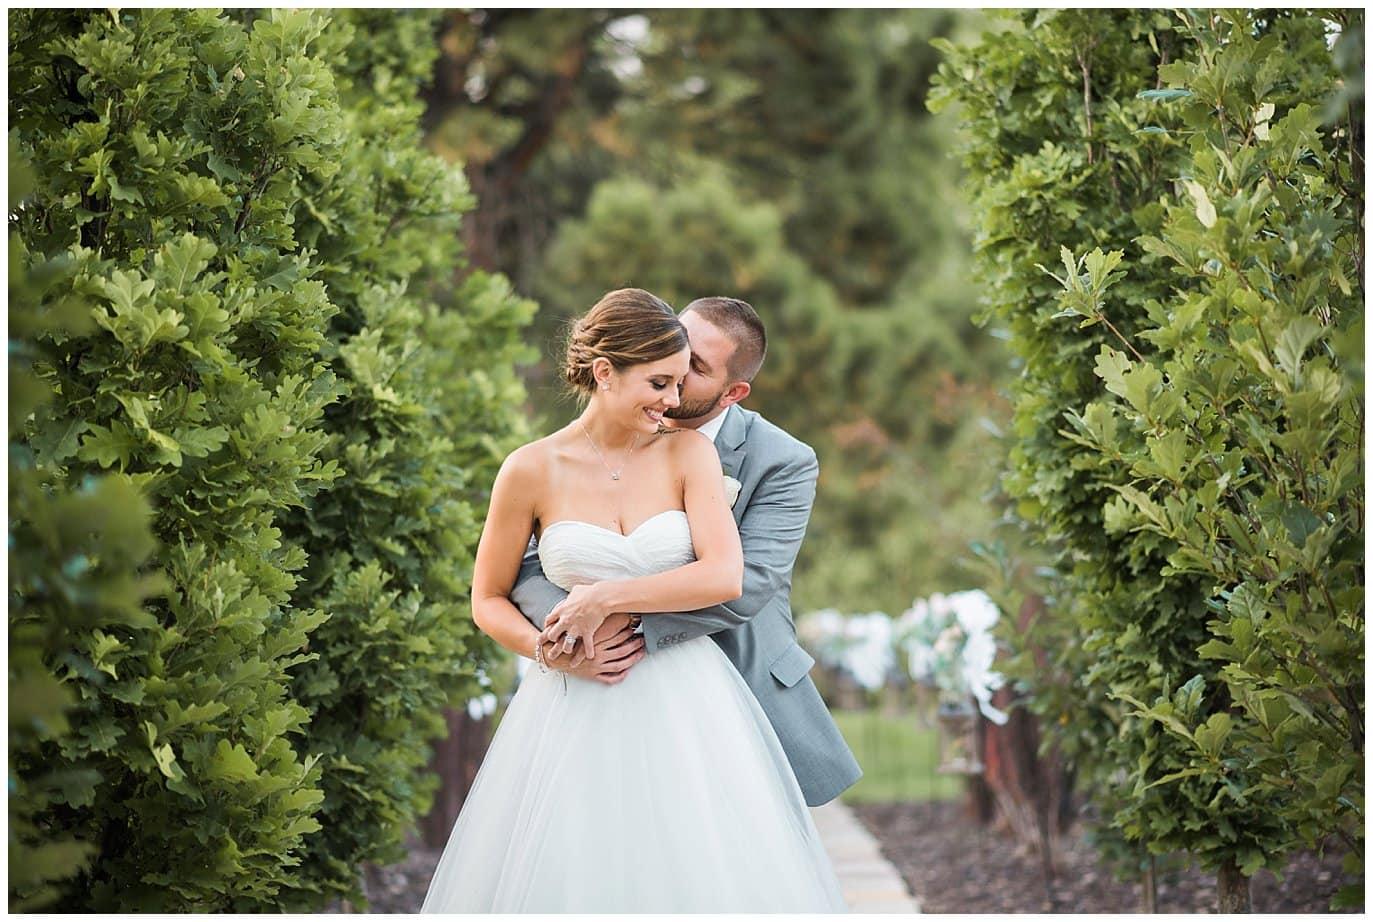 Balderia on the Water tuscan wedding venue photo